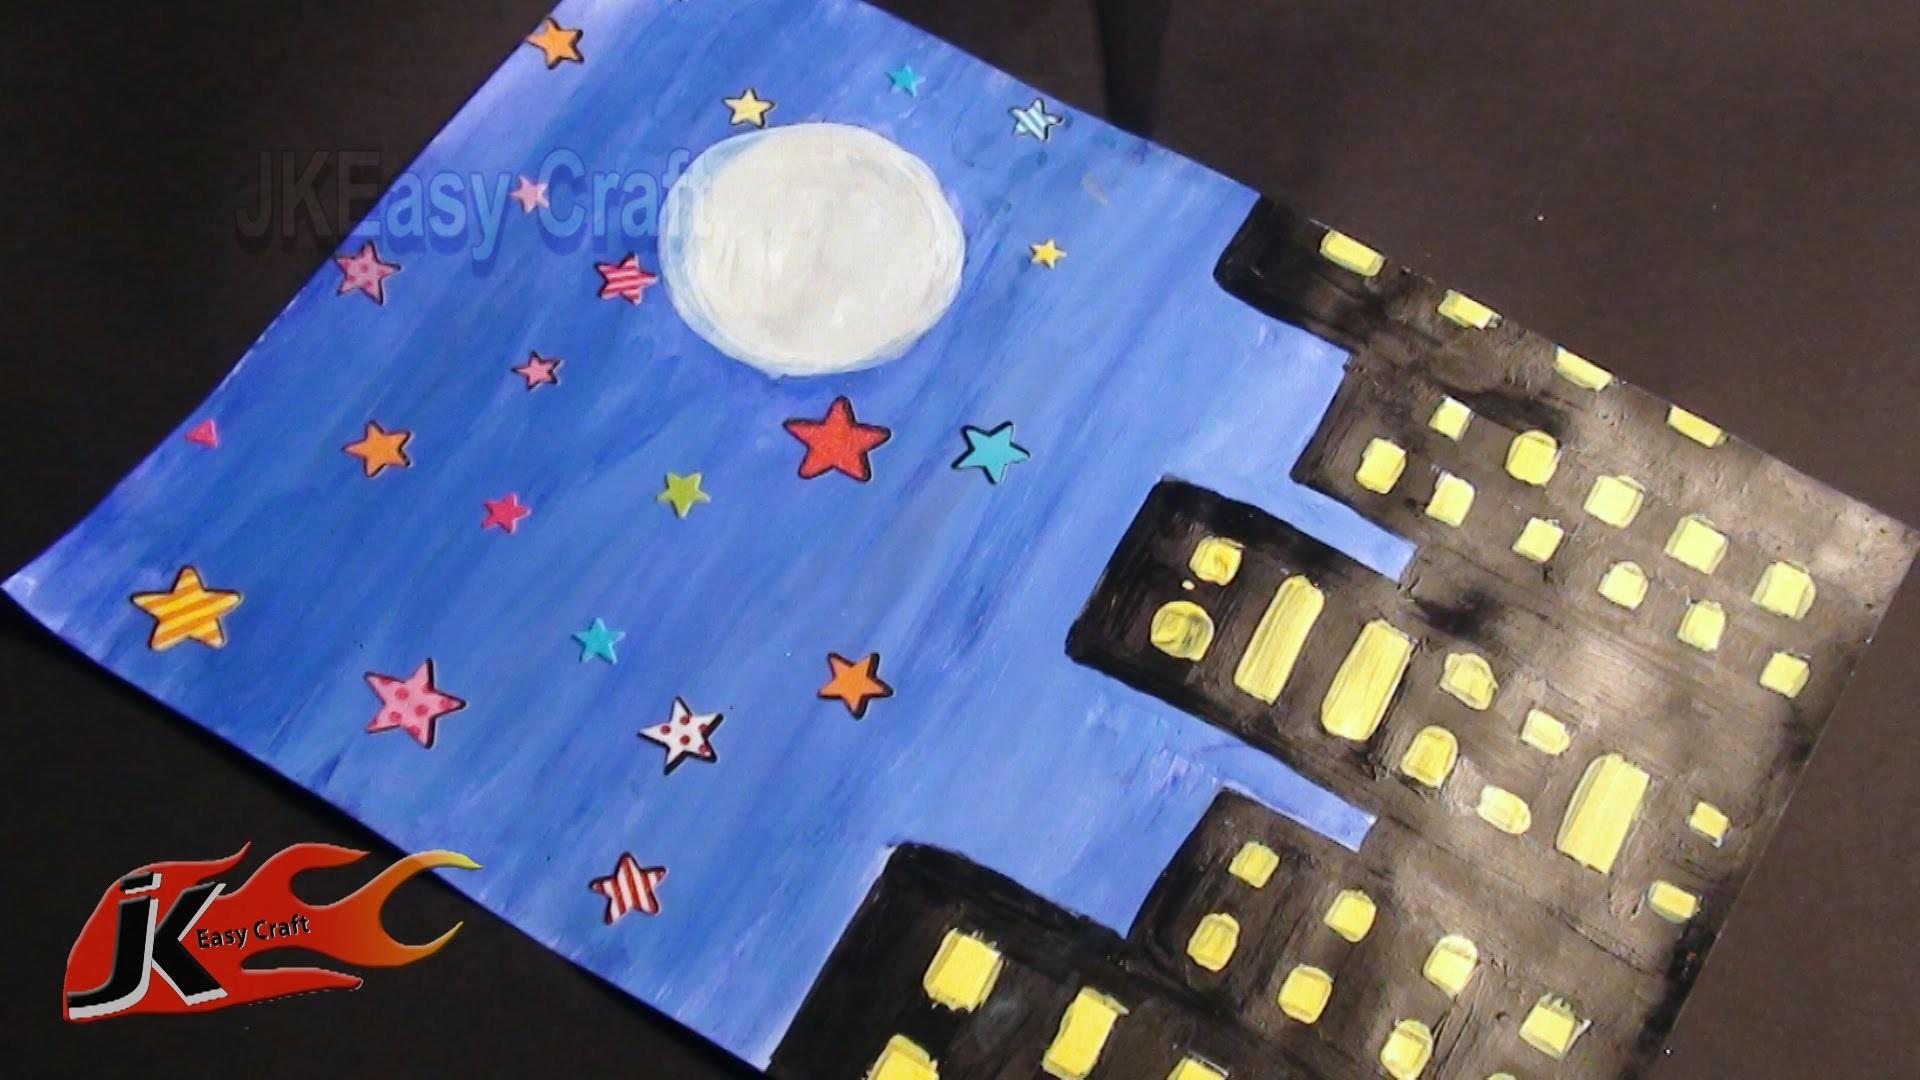 Draw Night scene | School Project  For Kids | JK Easy Craft 017